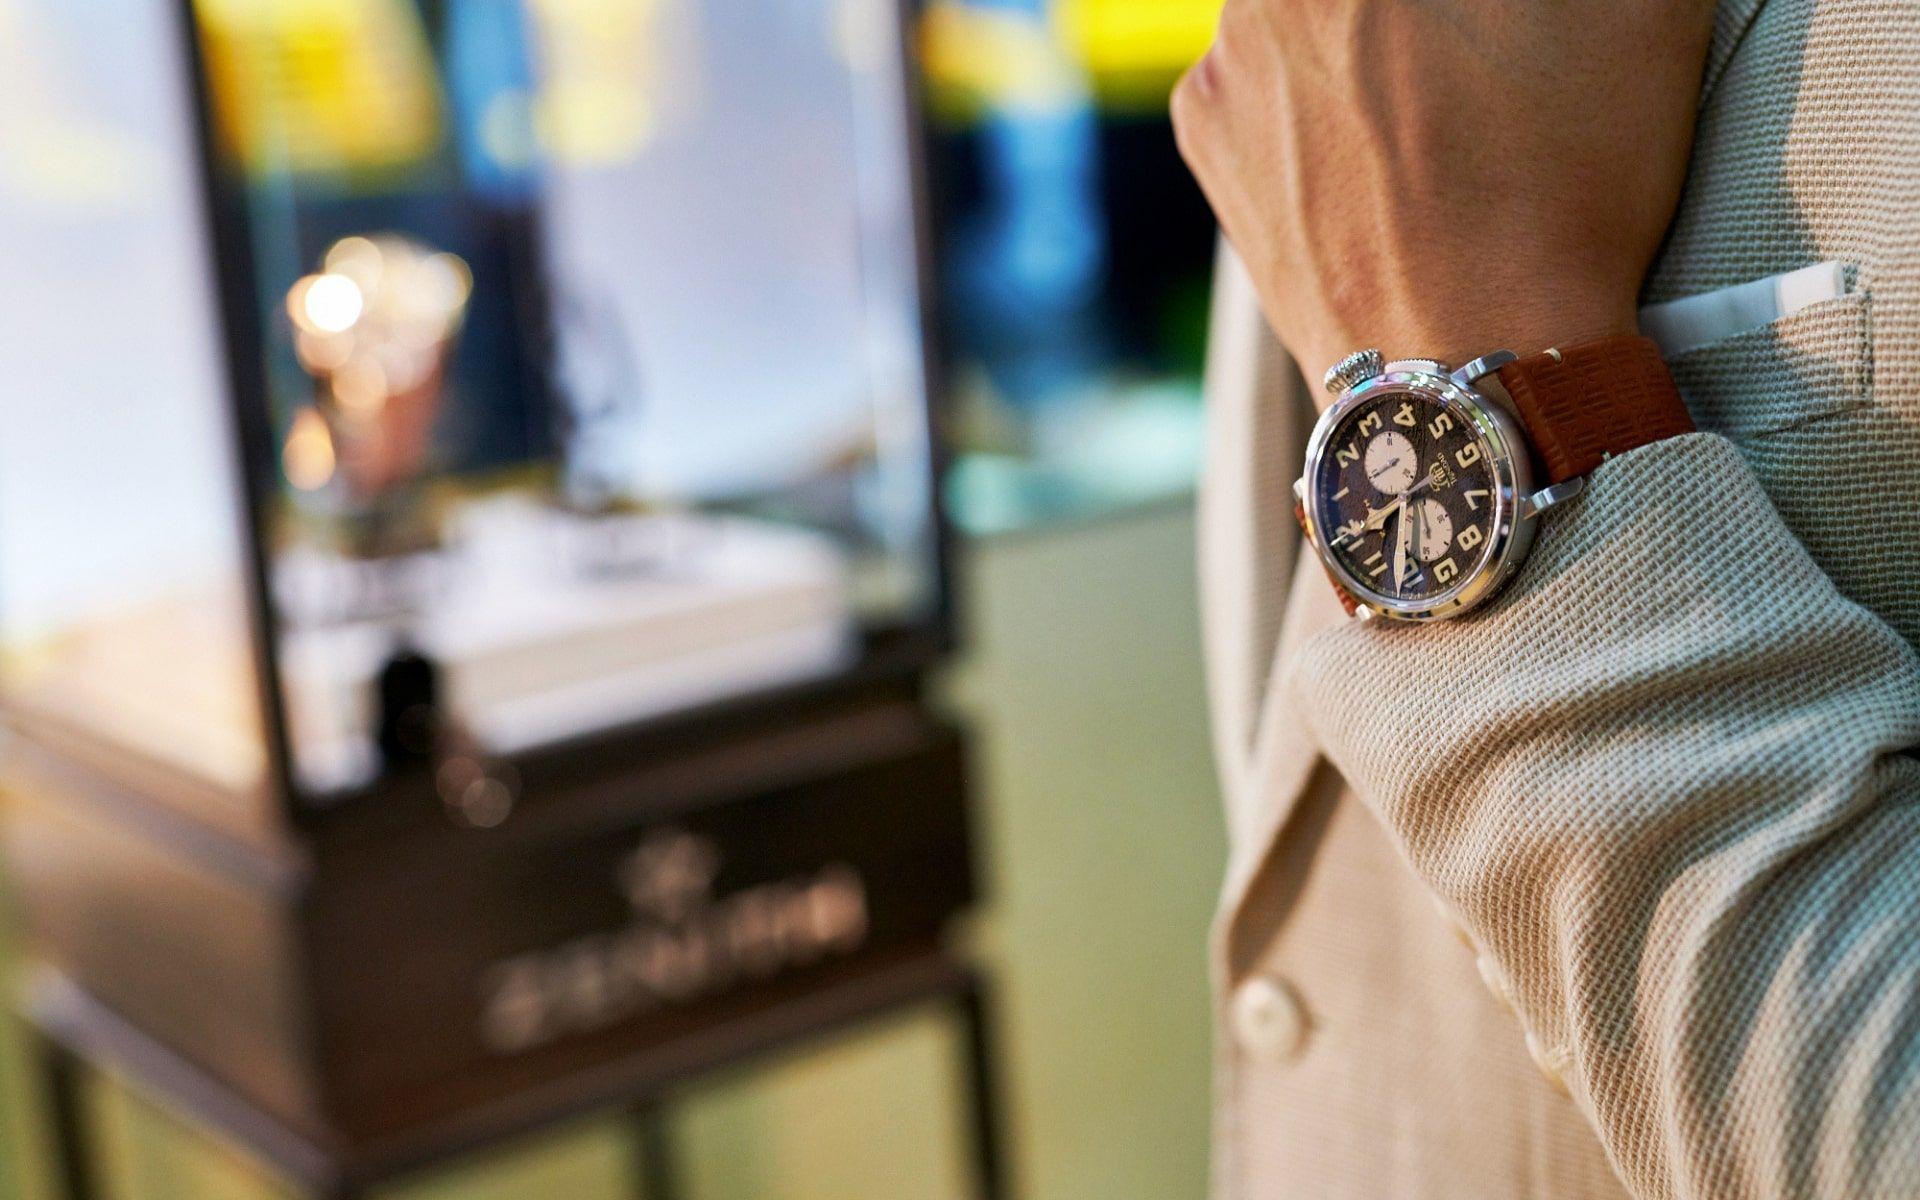 Introducing Zenith Pilot Type 20 Chronograph Trinidad Edition